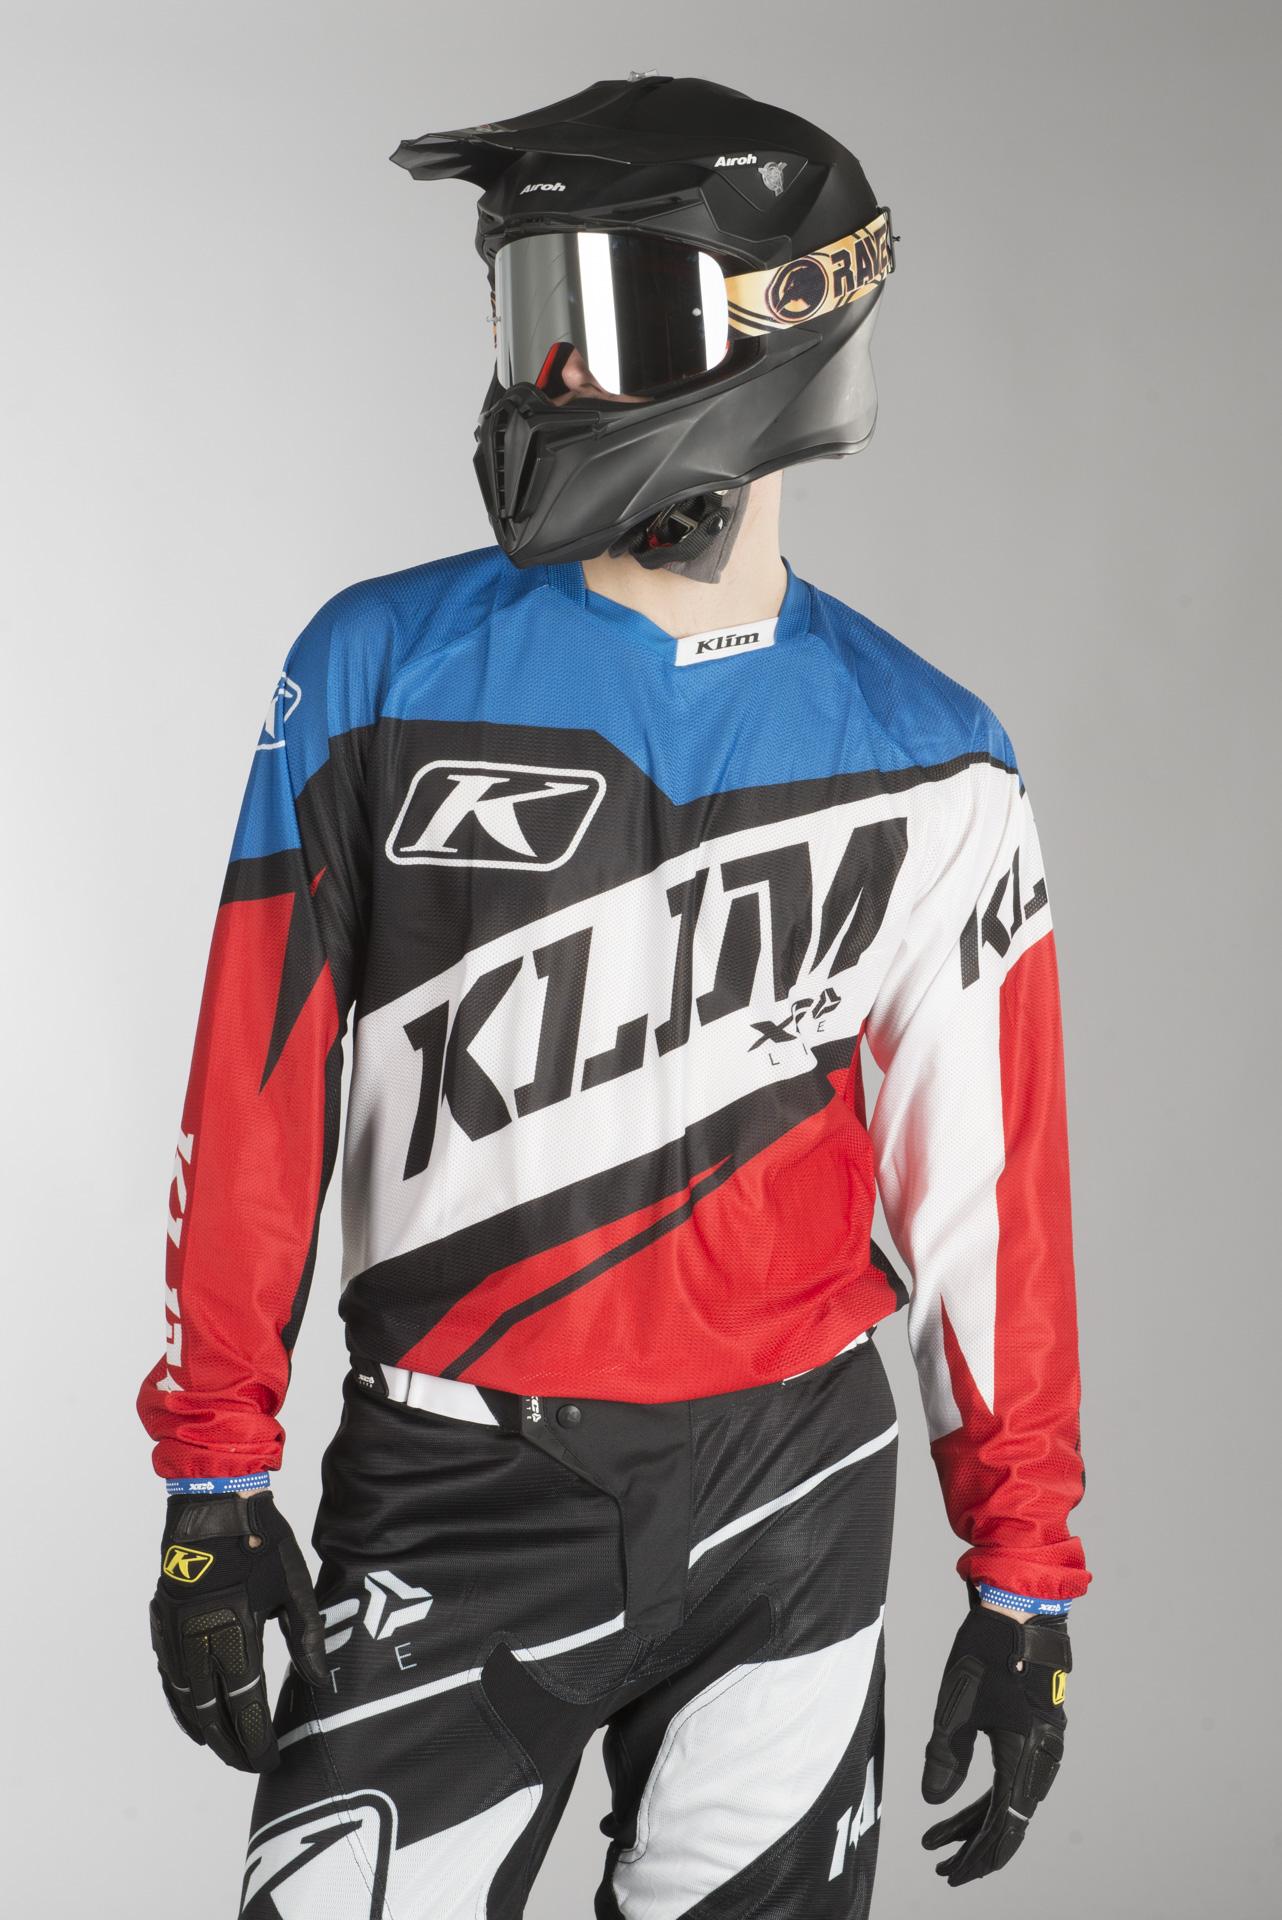 5003-002-120-100 KLIM XC Lite Jersey SM Red Hai Vina CO LTD 5003-002